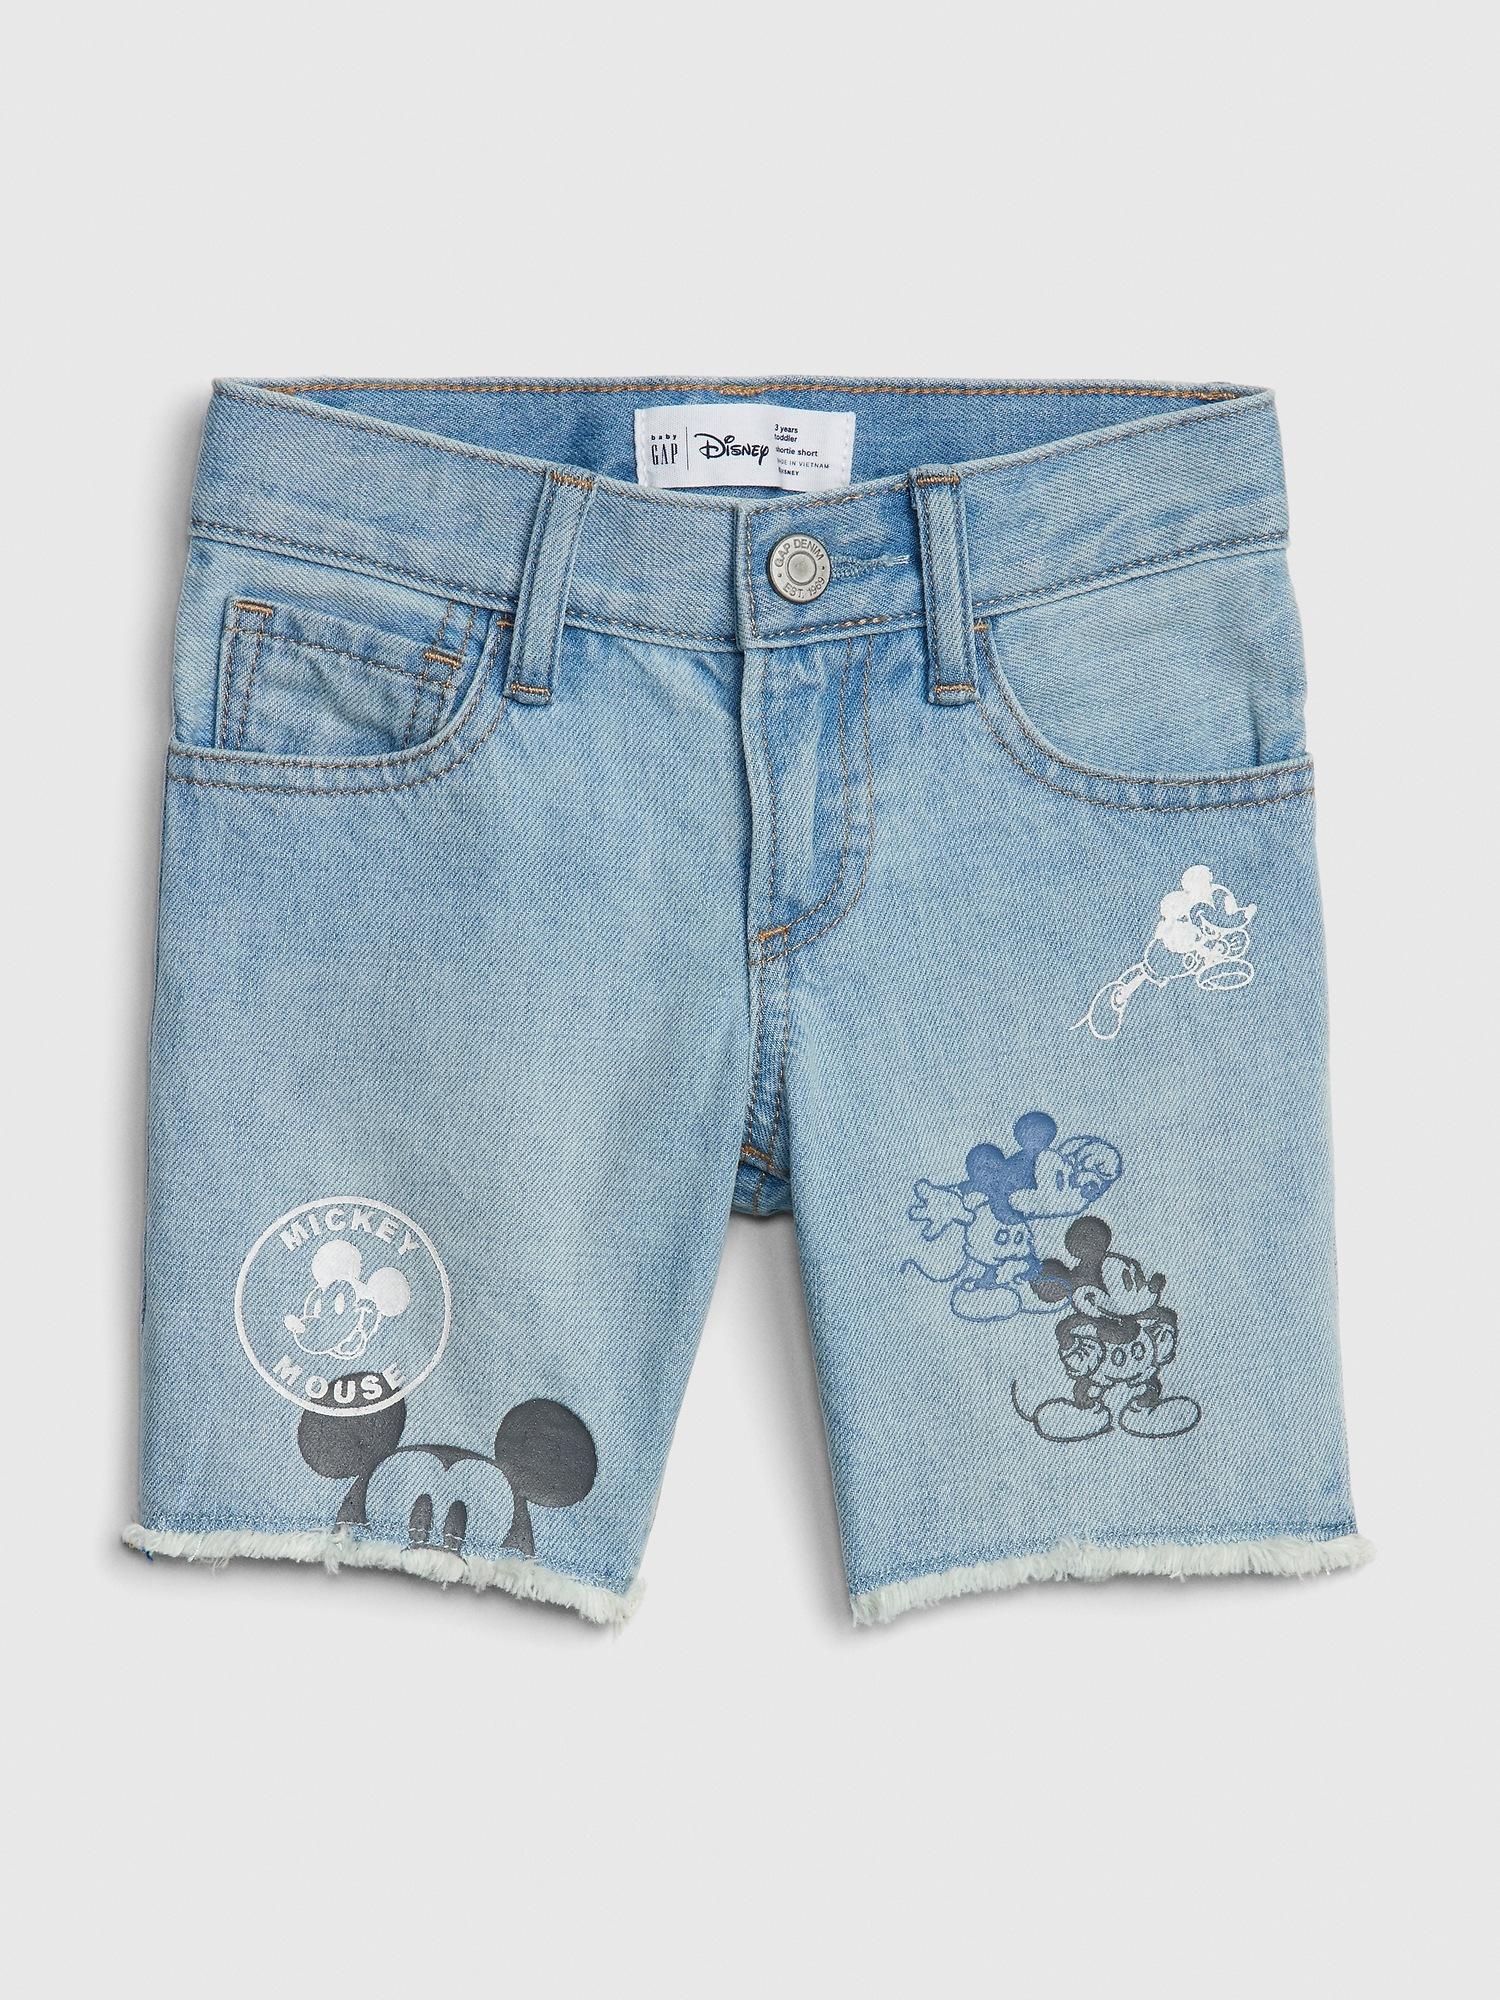 a3de3aeec3 babyGap | Disney Mickey Mouse Denim Shorts | Gap